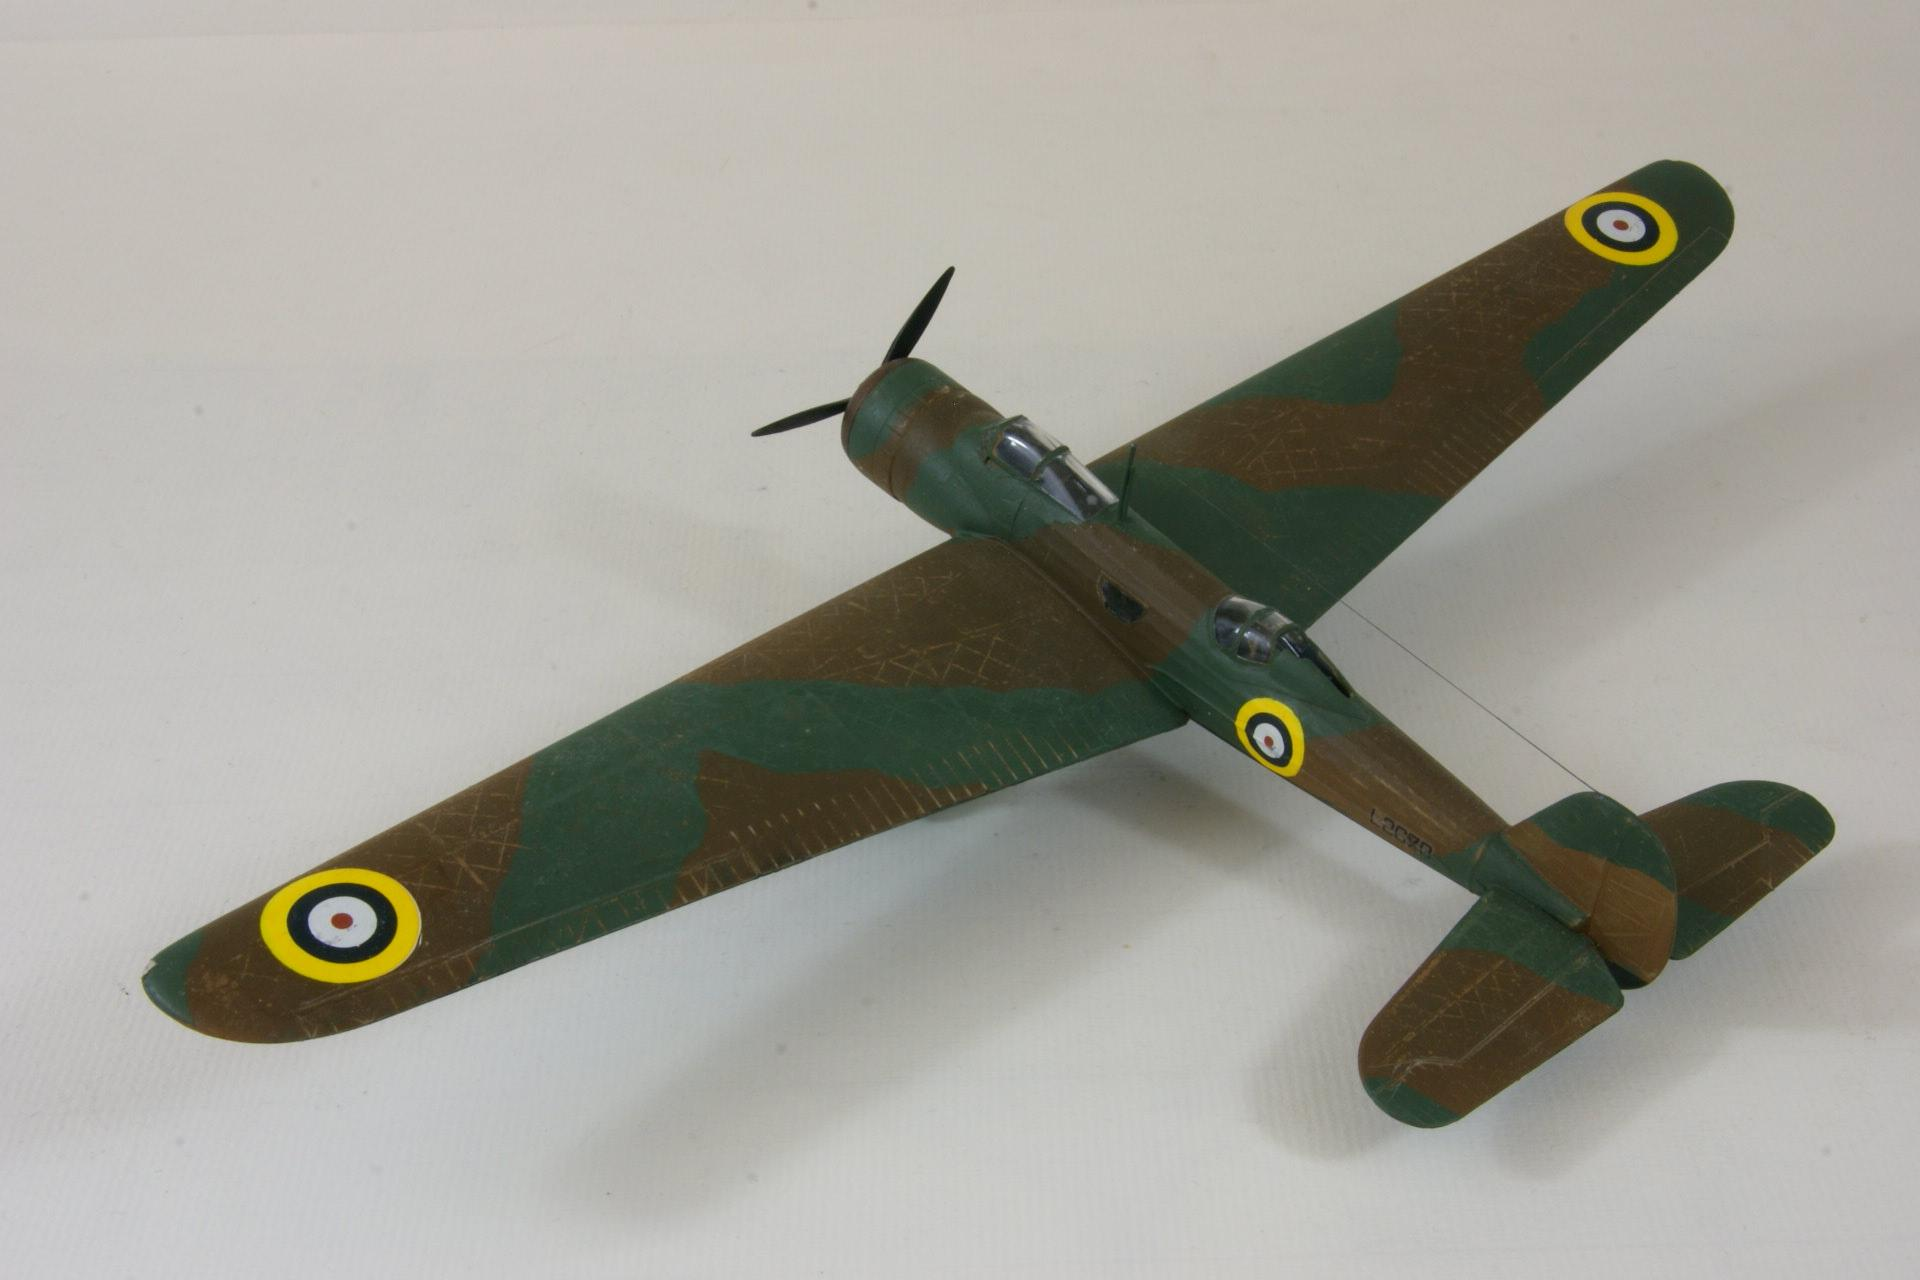 Vickers wellesley i lrdu 2